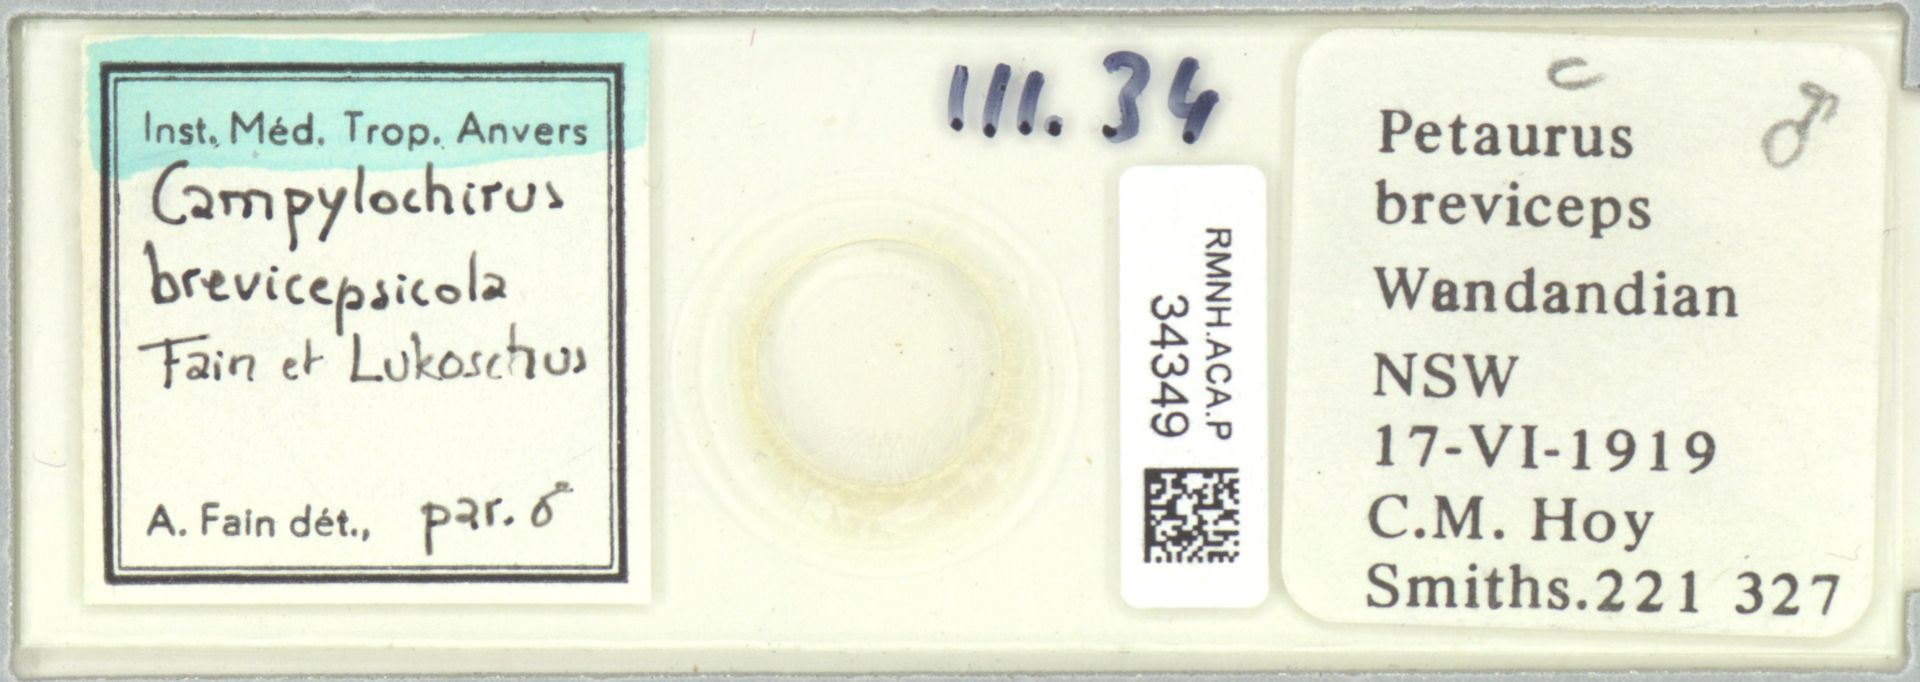 RMNH.ACA.P.34349 | Campylochirus brevicepsicola Fain et Lukoschus